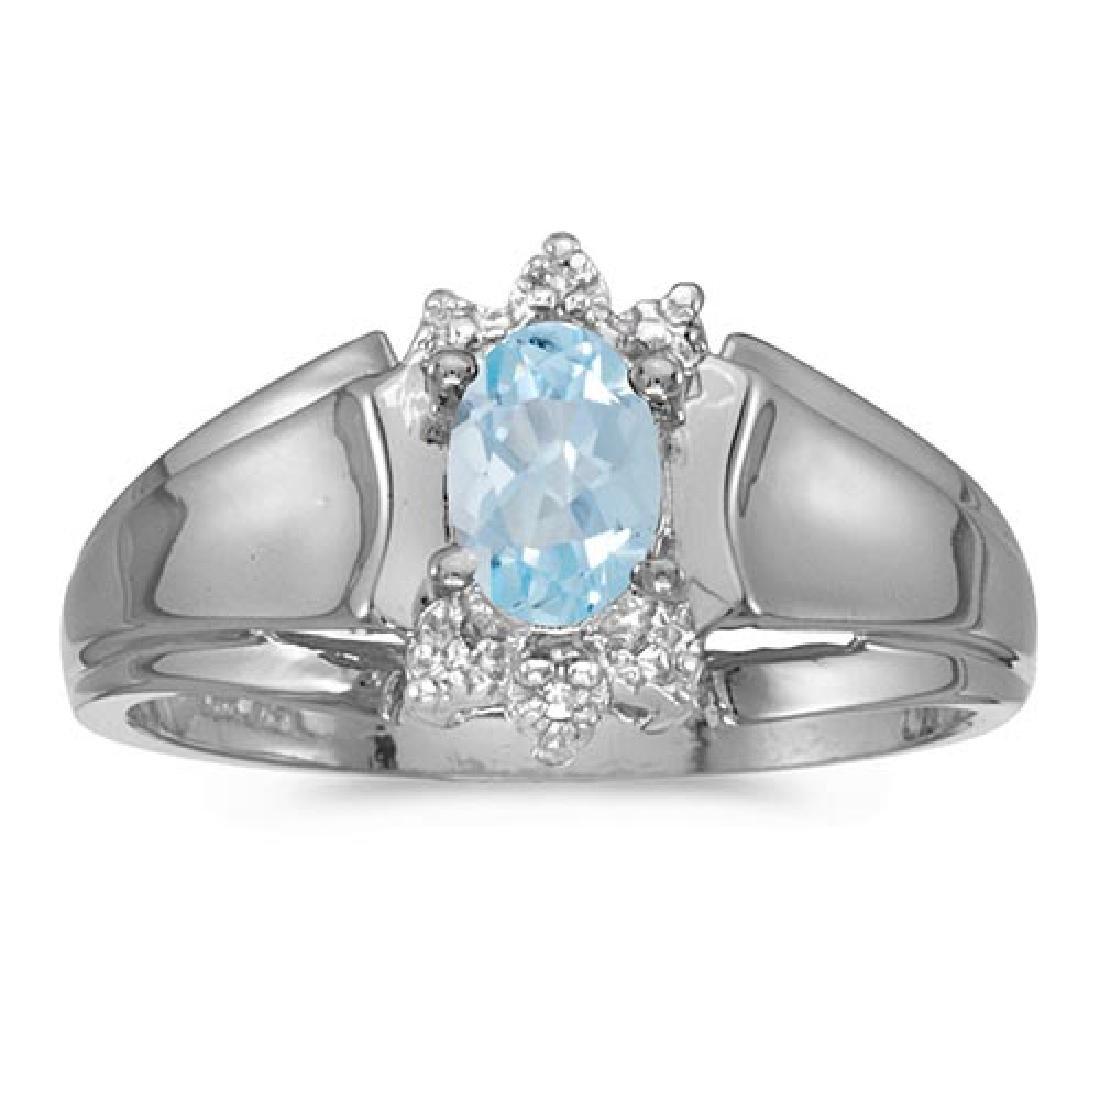 Certified 14k White Gold Oval Aquamarine And Diamond Ri